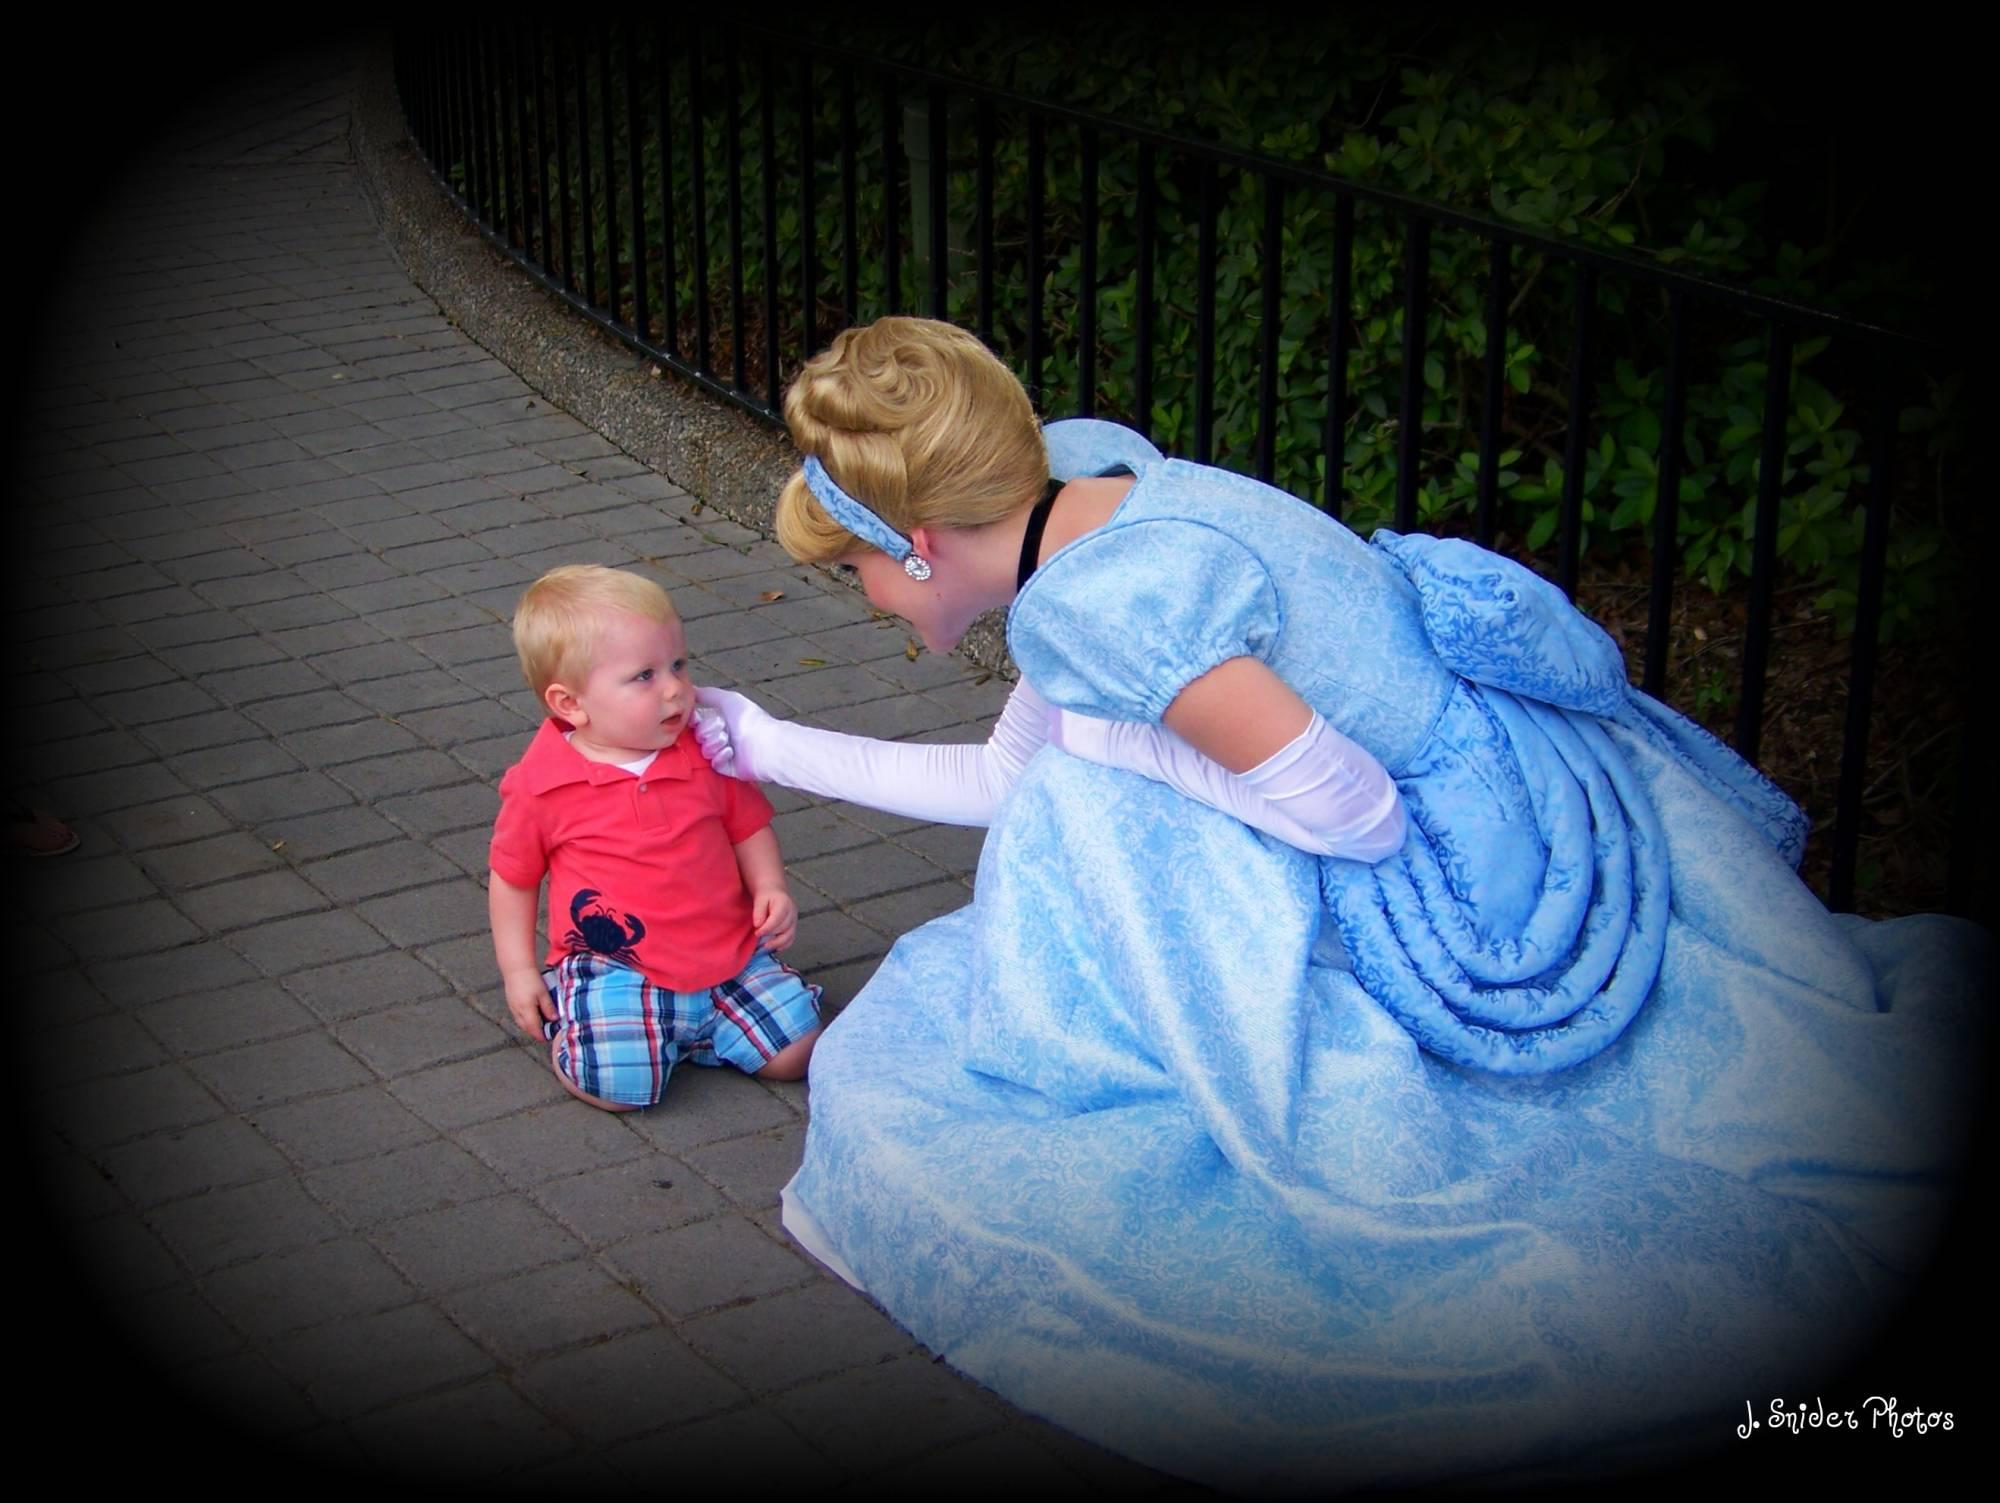 France - Cinderella Meets a Prince photo